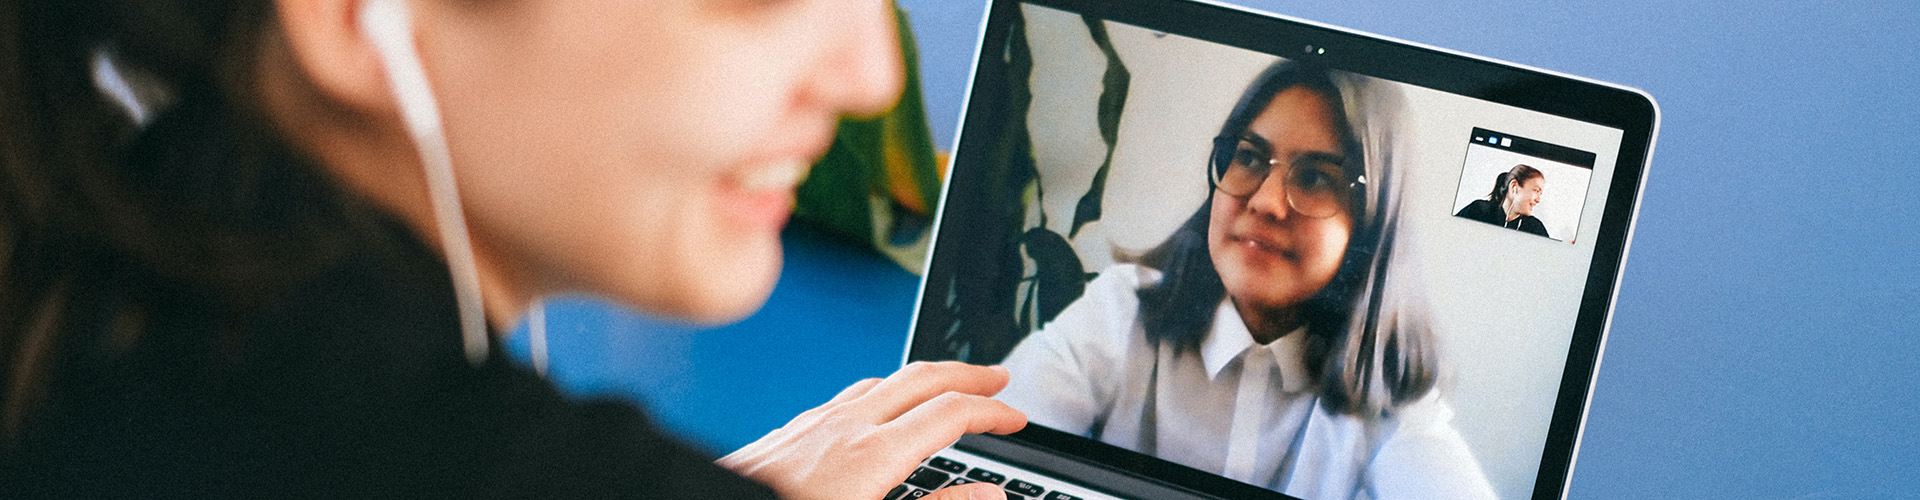 women-in-telehealth-visit